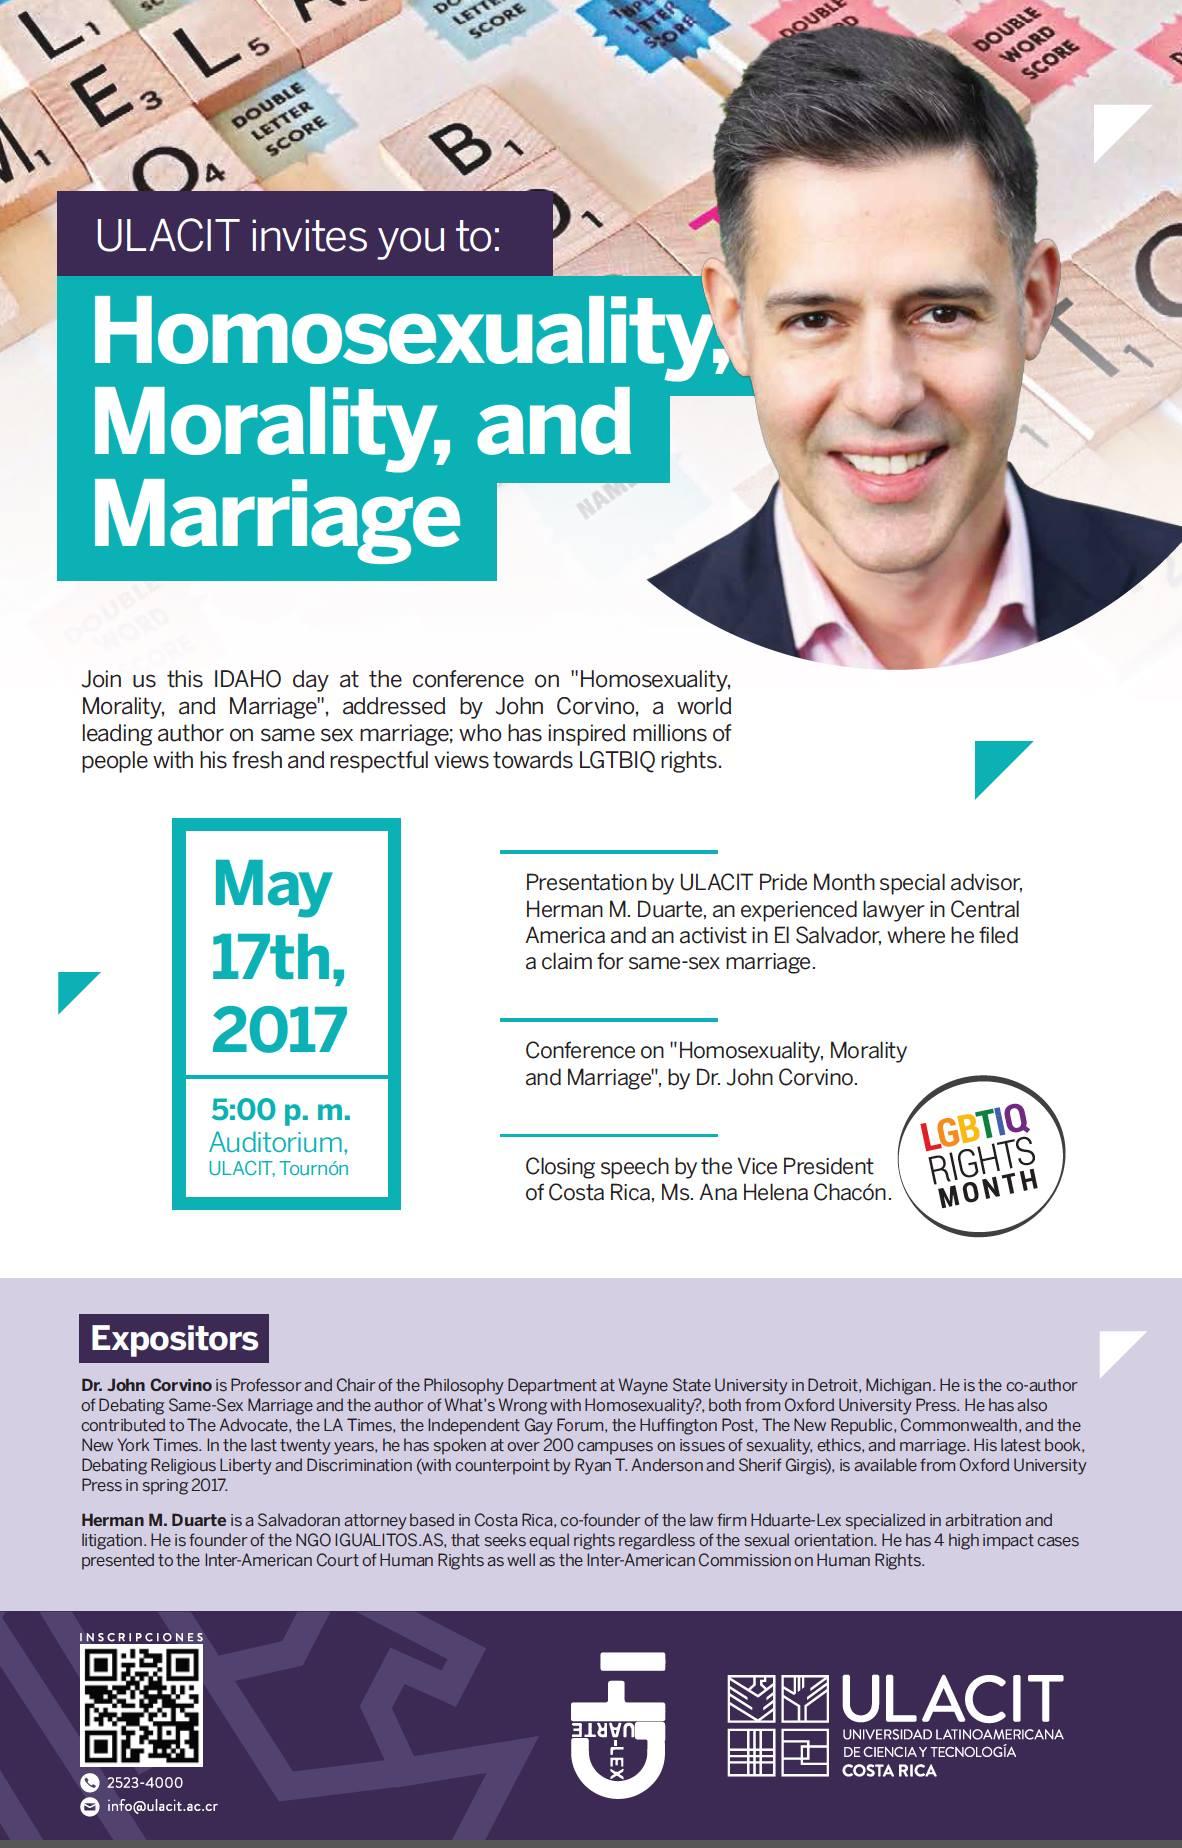 Homosexuality-morality-marriage-john-corvino-herman-duarte-ulacit-same-sex-marriage